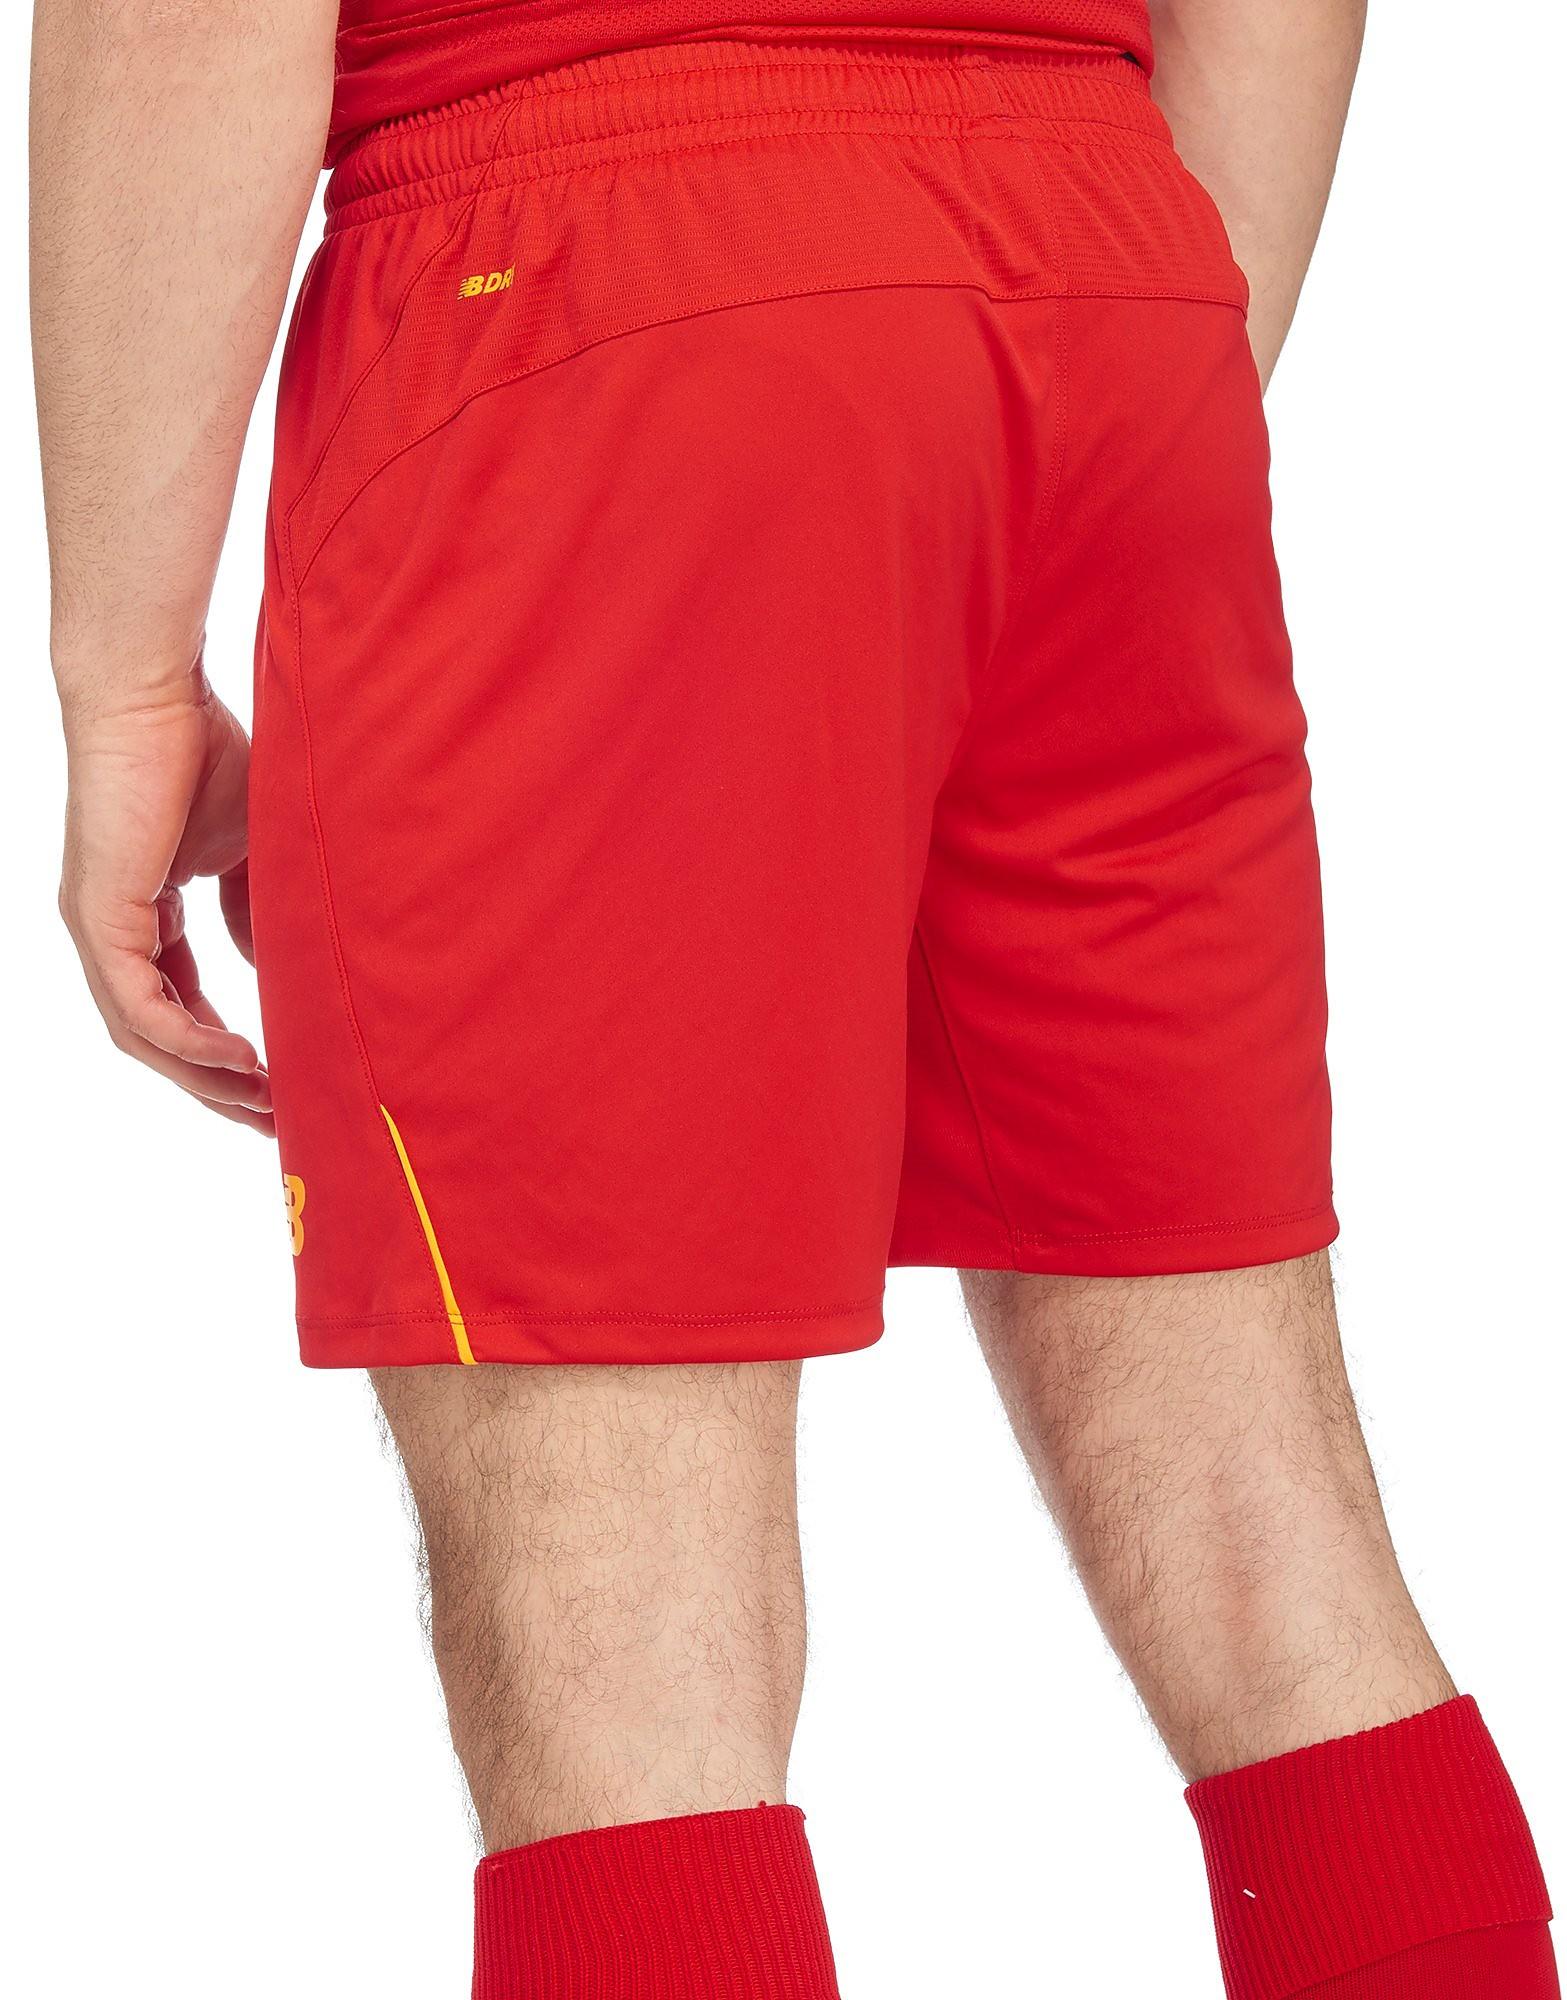 New Balance Liverpool FC 2016/17 Home Shorts